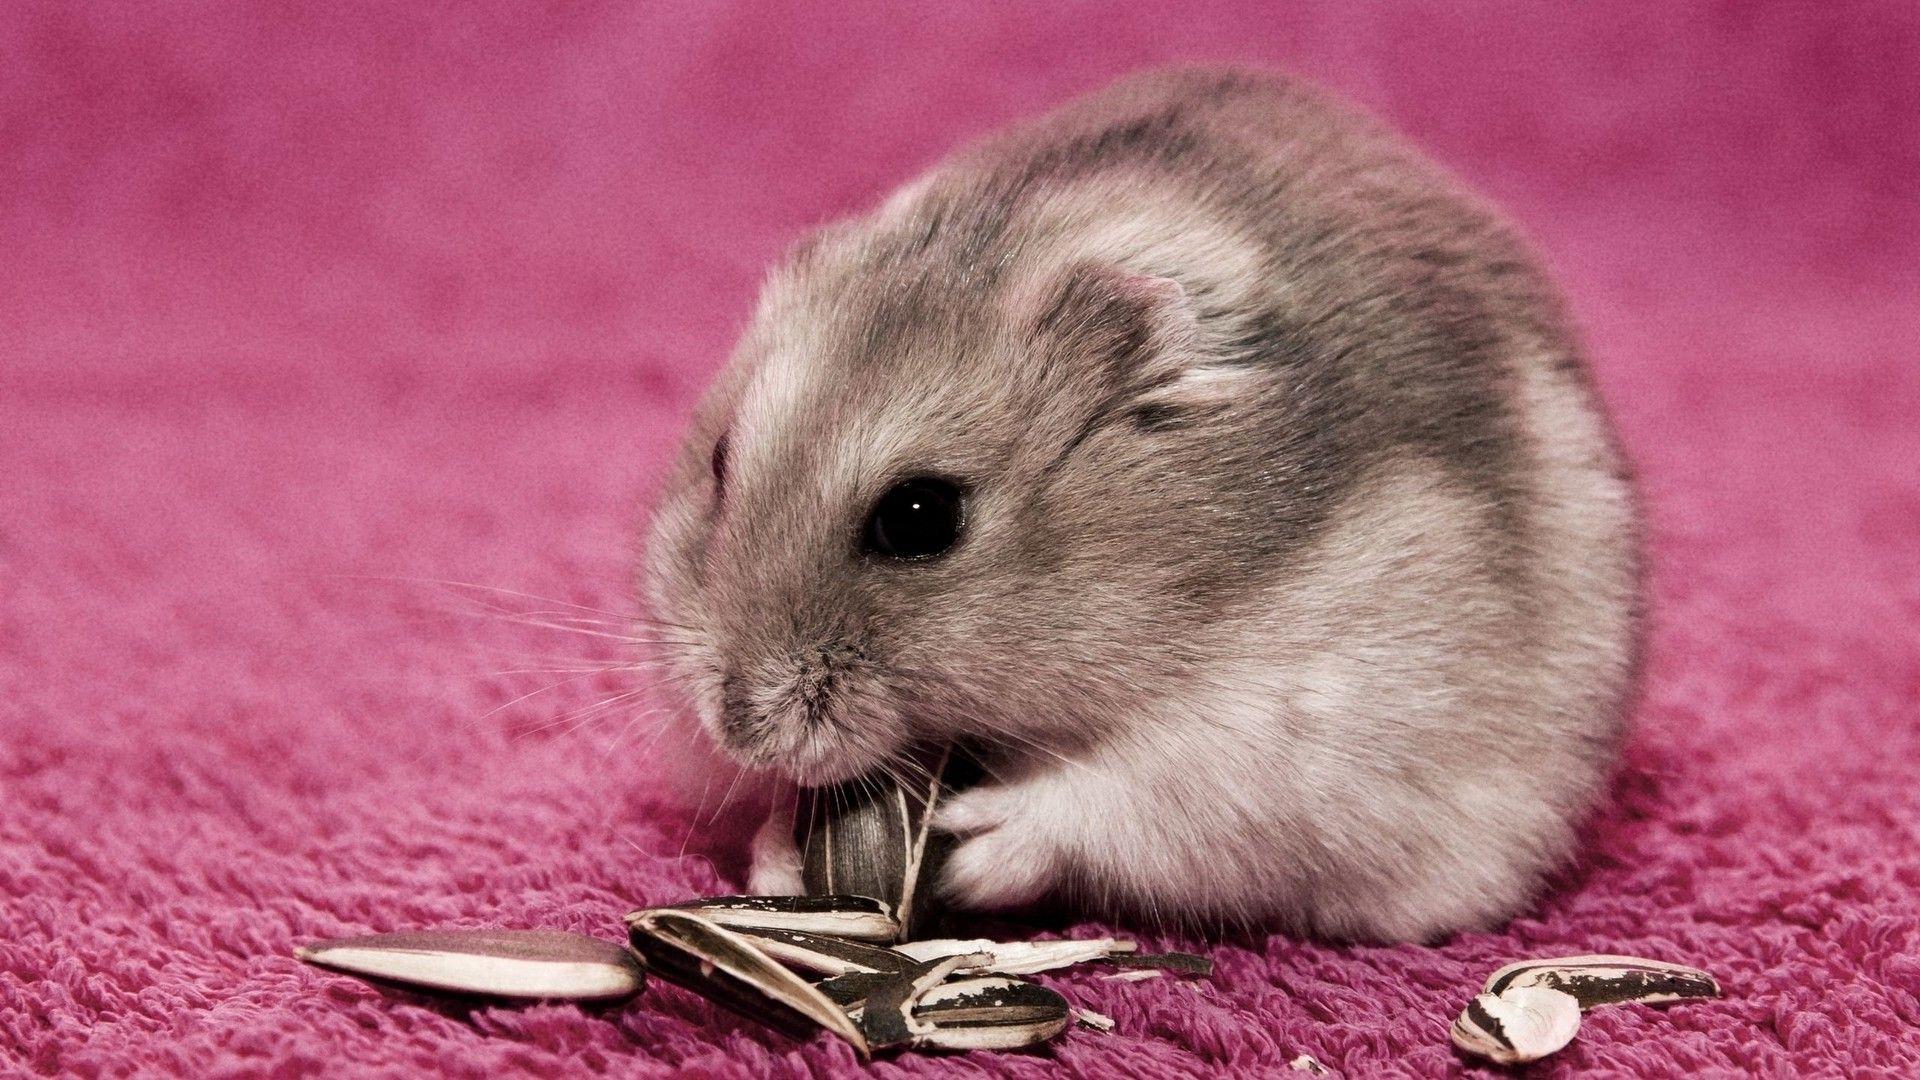 hamster on a pink carpet 15948 1920x1080